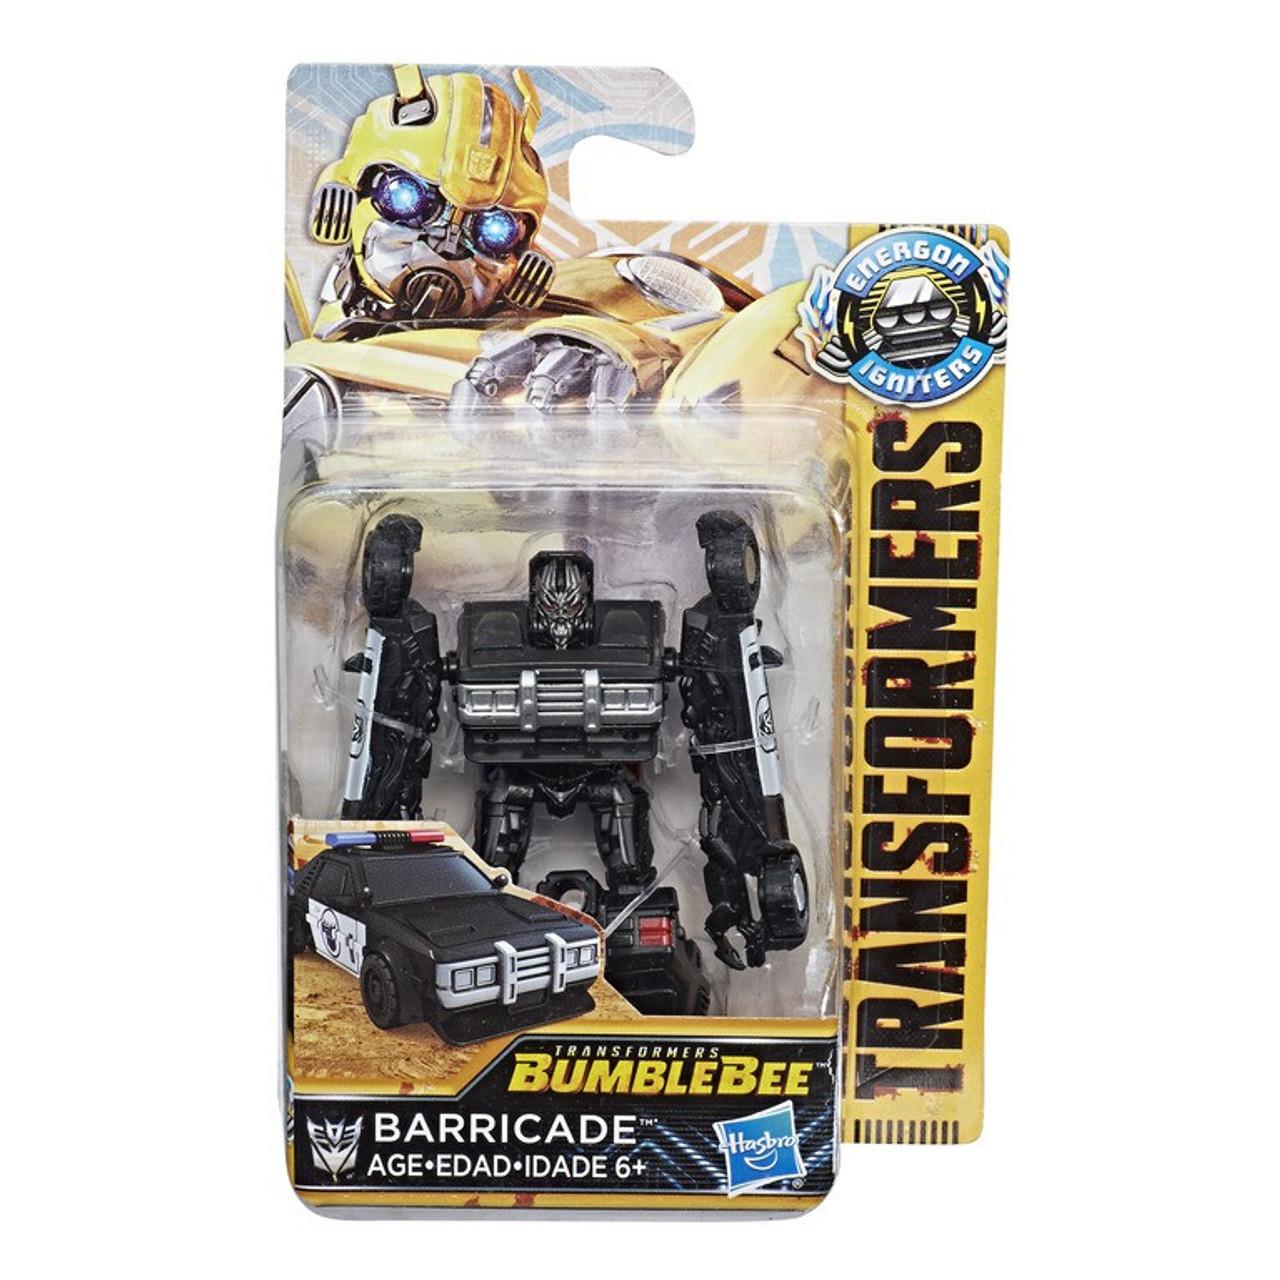 Brand New Barricade Transformers Bumblebee Movie Legions